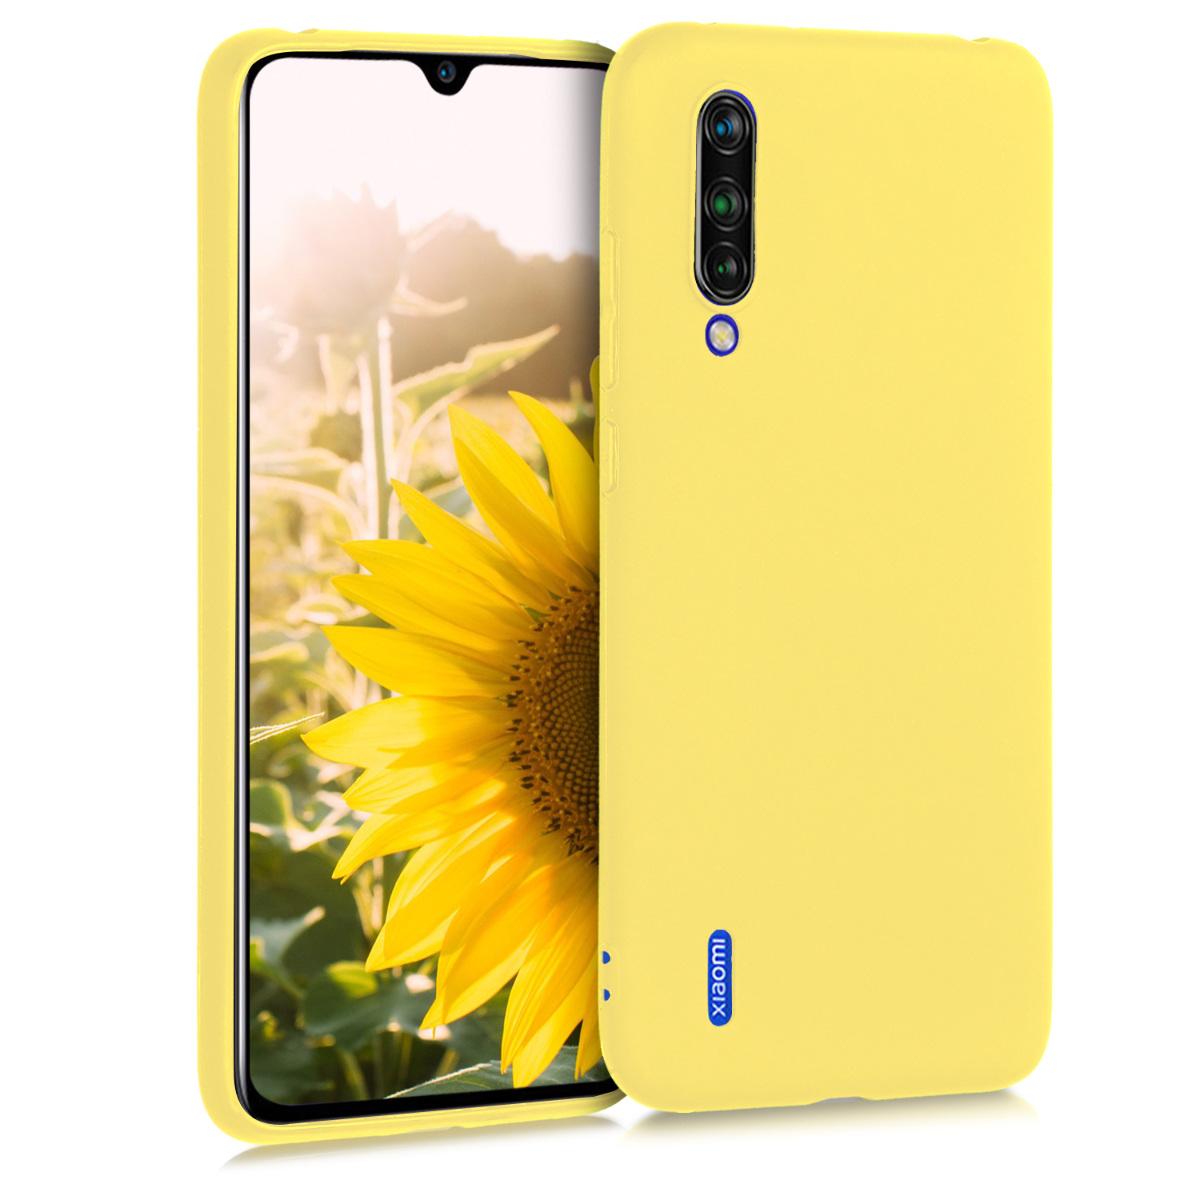 KW Θήκη Σιλικόνης Xiaomi Mi 9 Lite - Yellow Matte (50582.49)